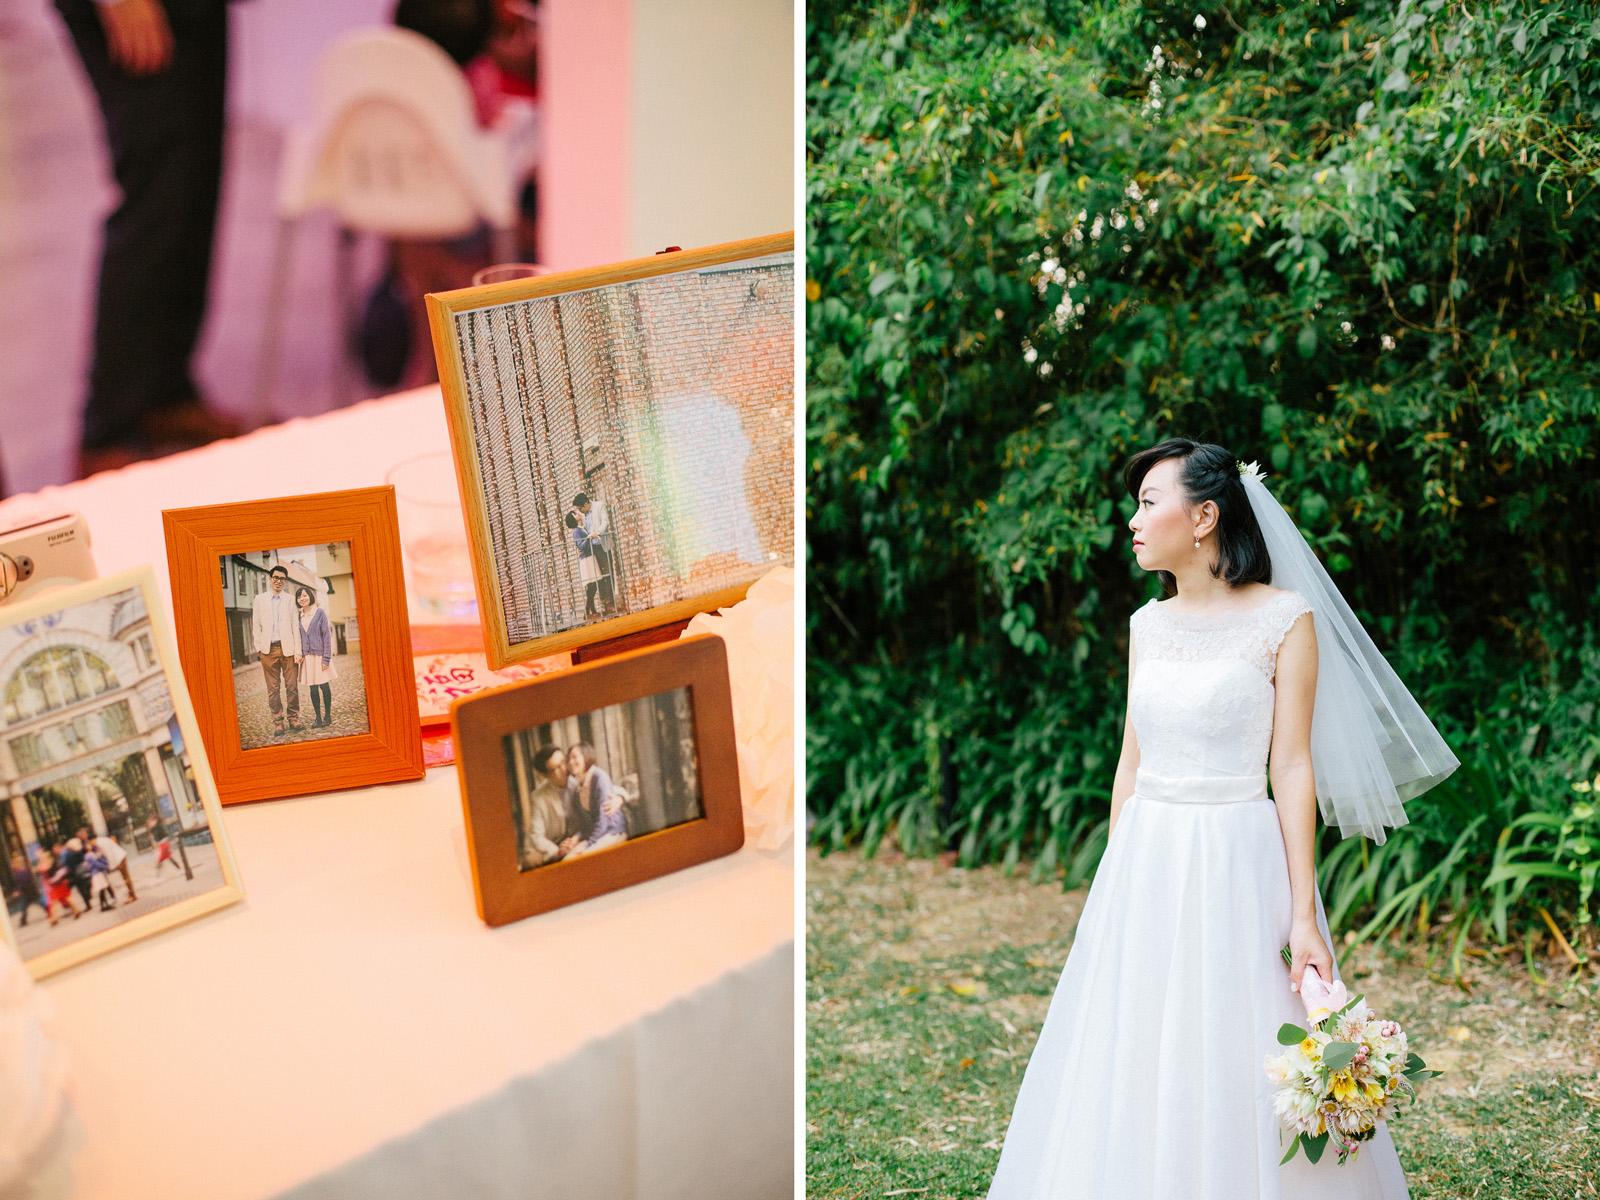 singapore-wedding-travel-photographer-faith-alvin-wedding-wmt-27.jpg